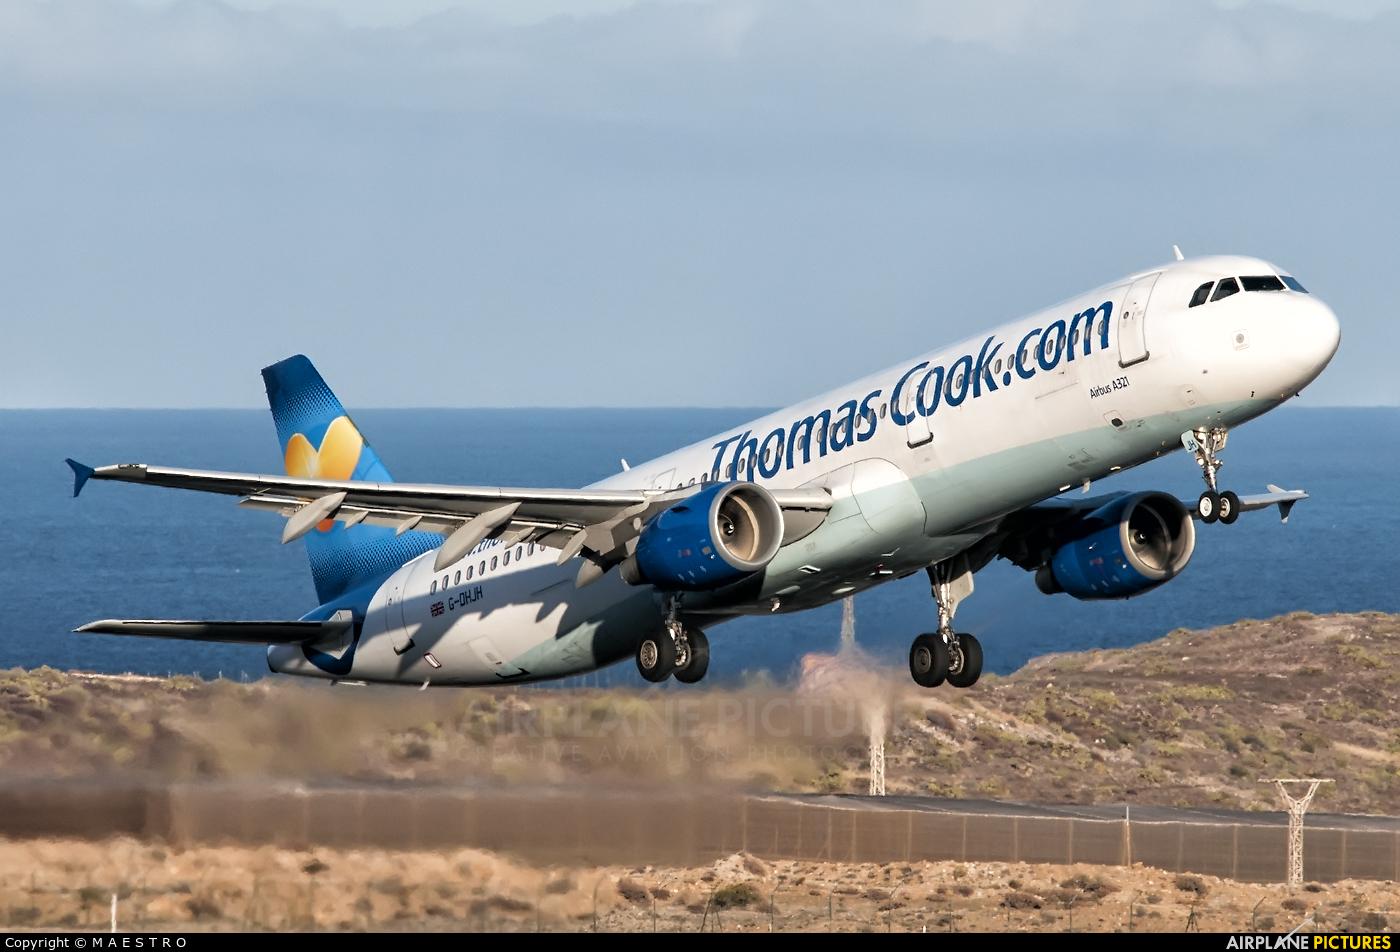 Thomas Cook G-DHJH aircraft at Tenerife Sur - Reina Sofia